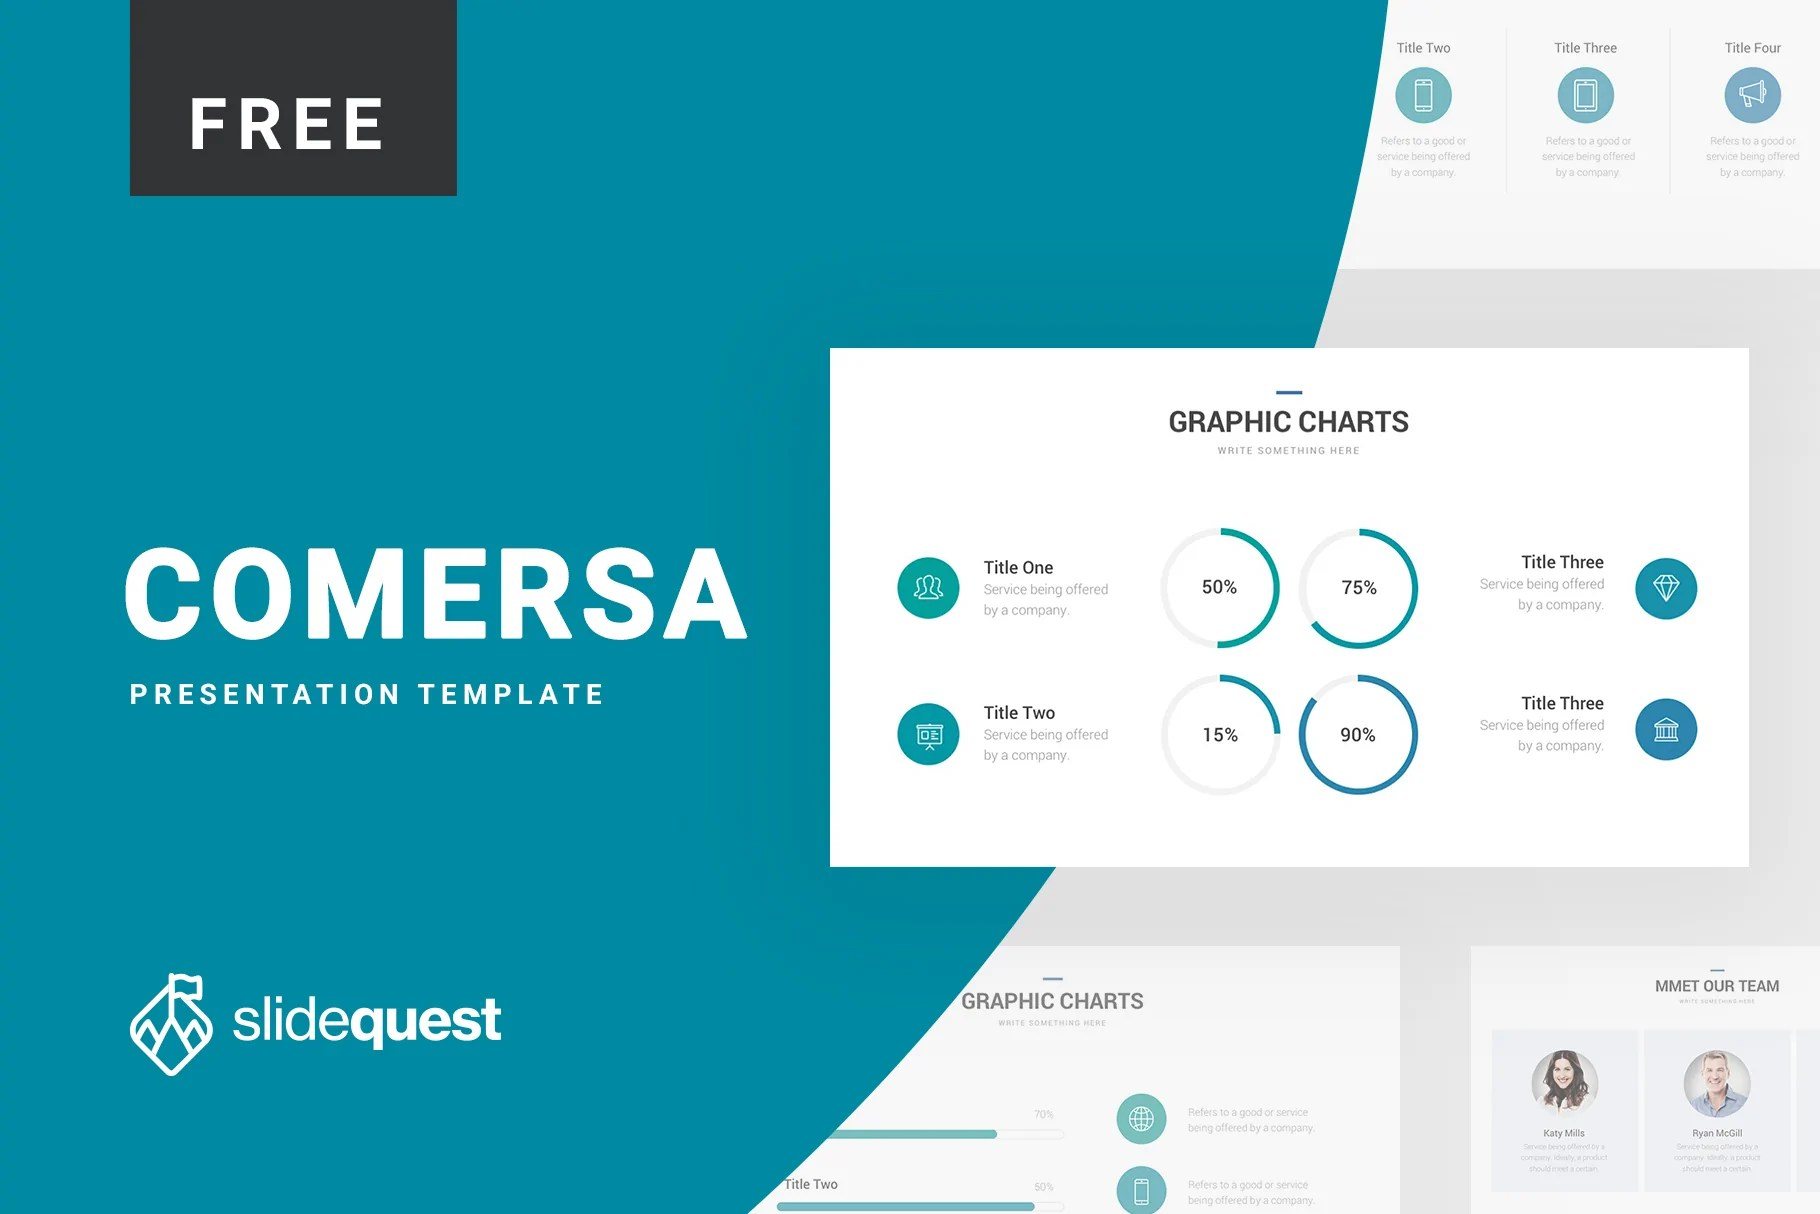 free presentation design templates